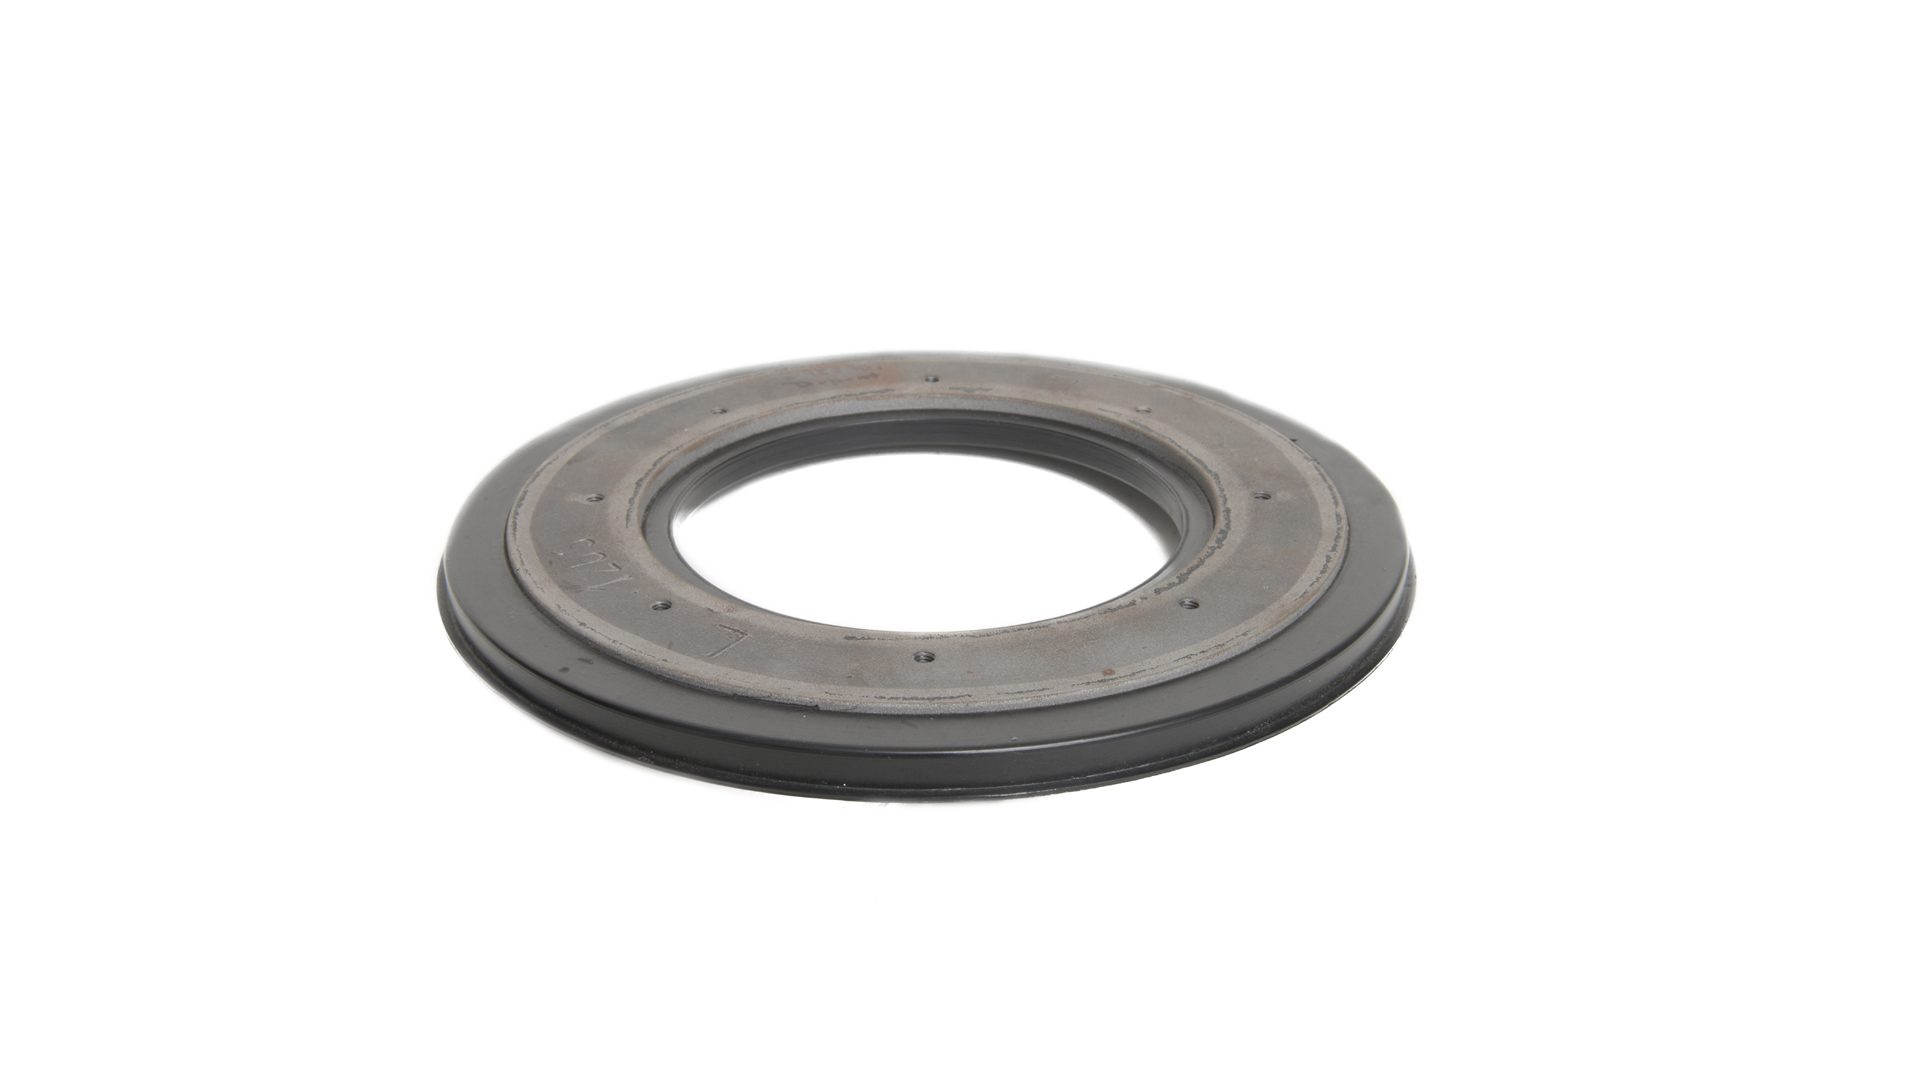 image of an industrial elastomer